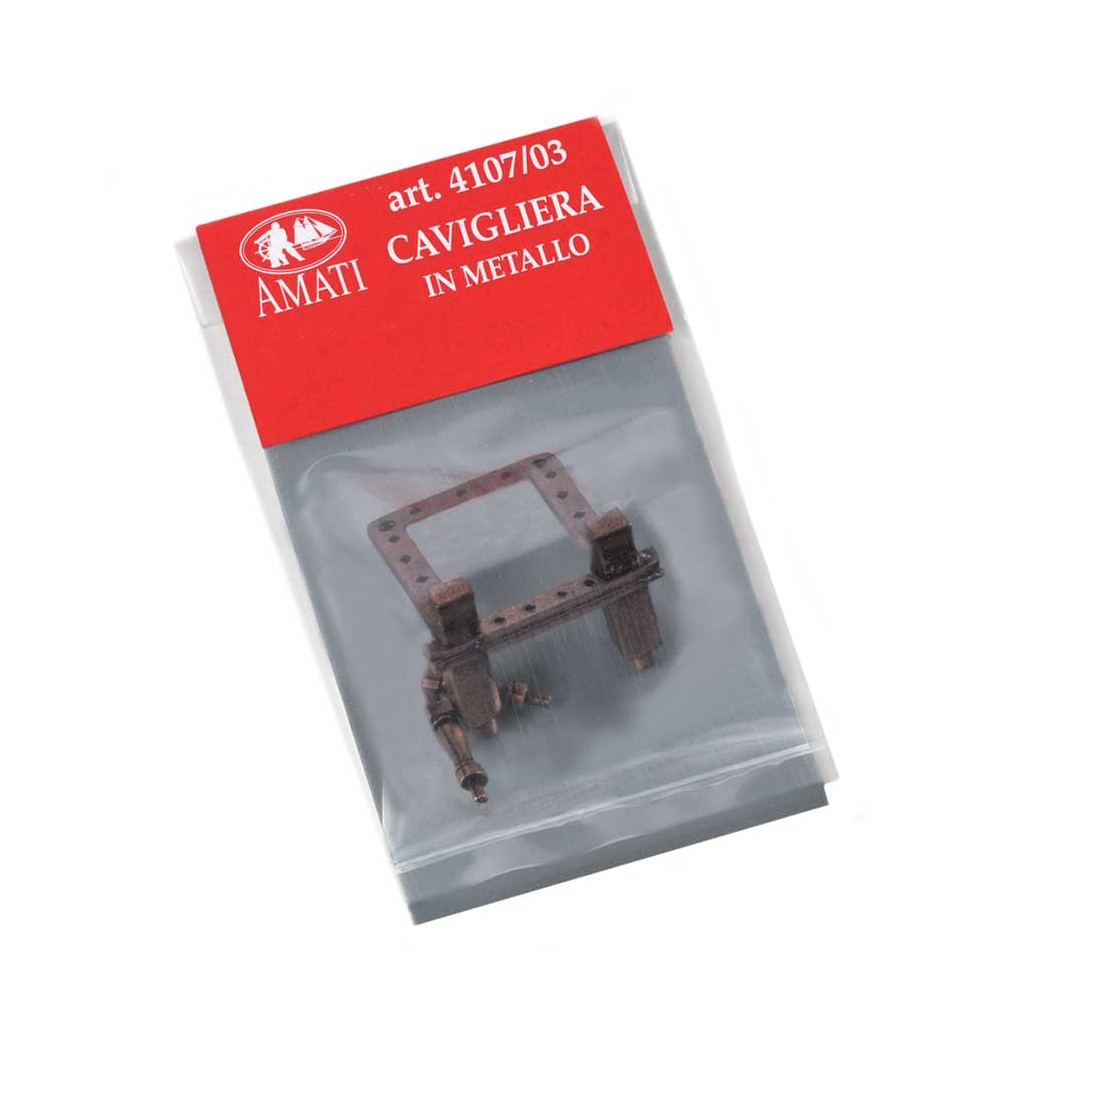 Râteliers métal mm. 30x23x12